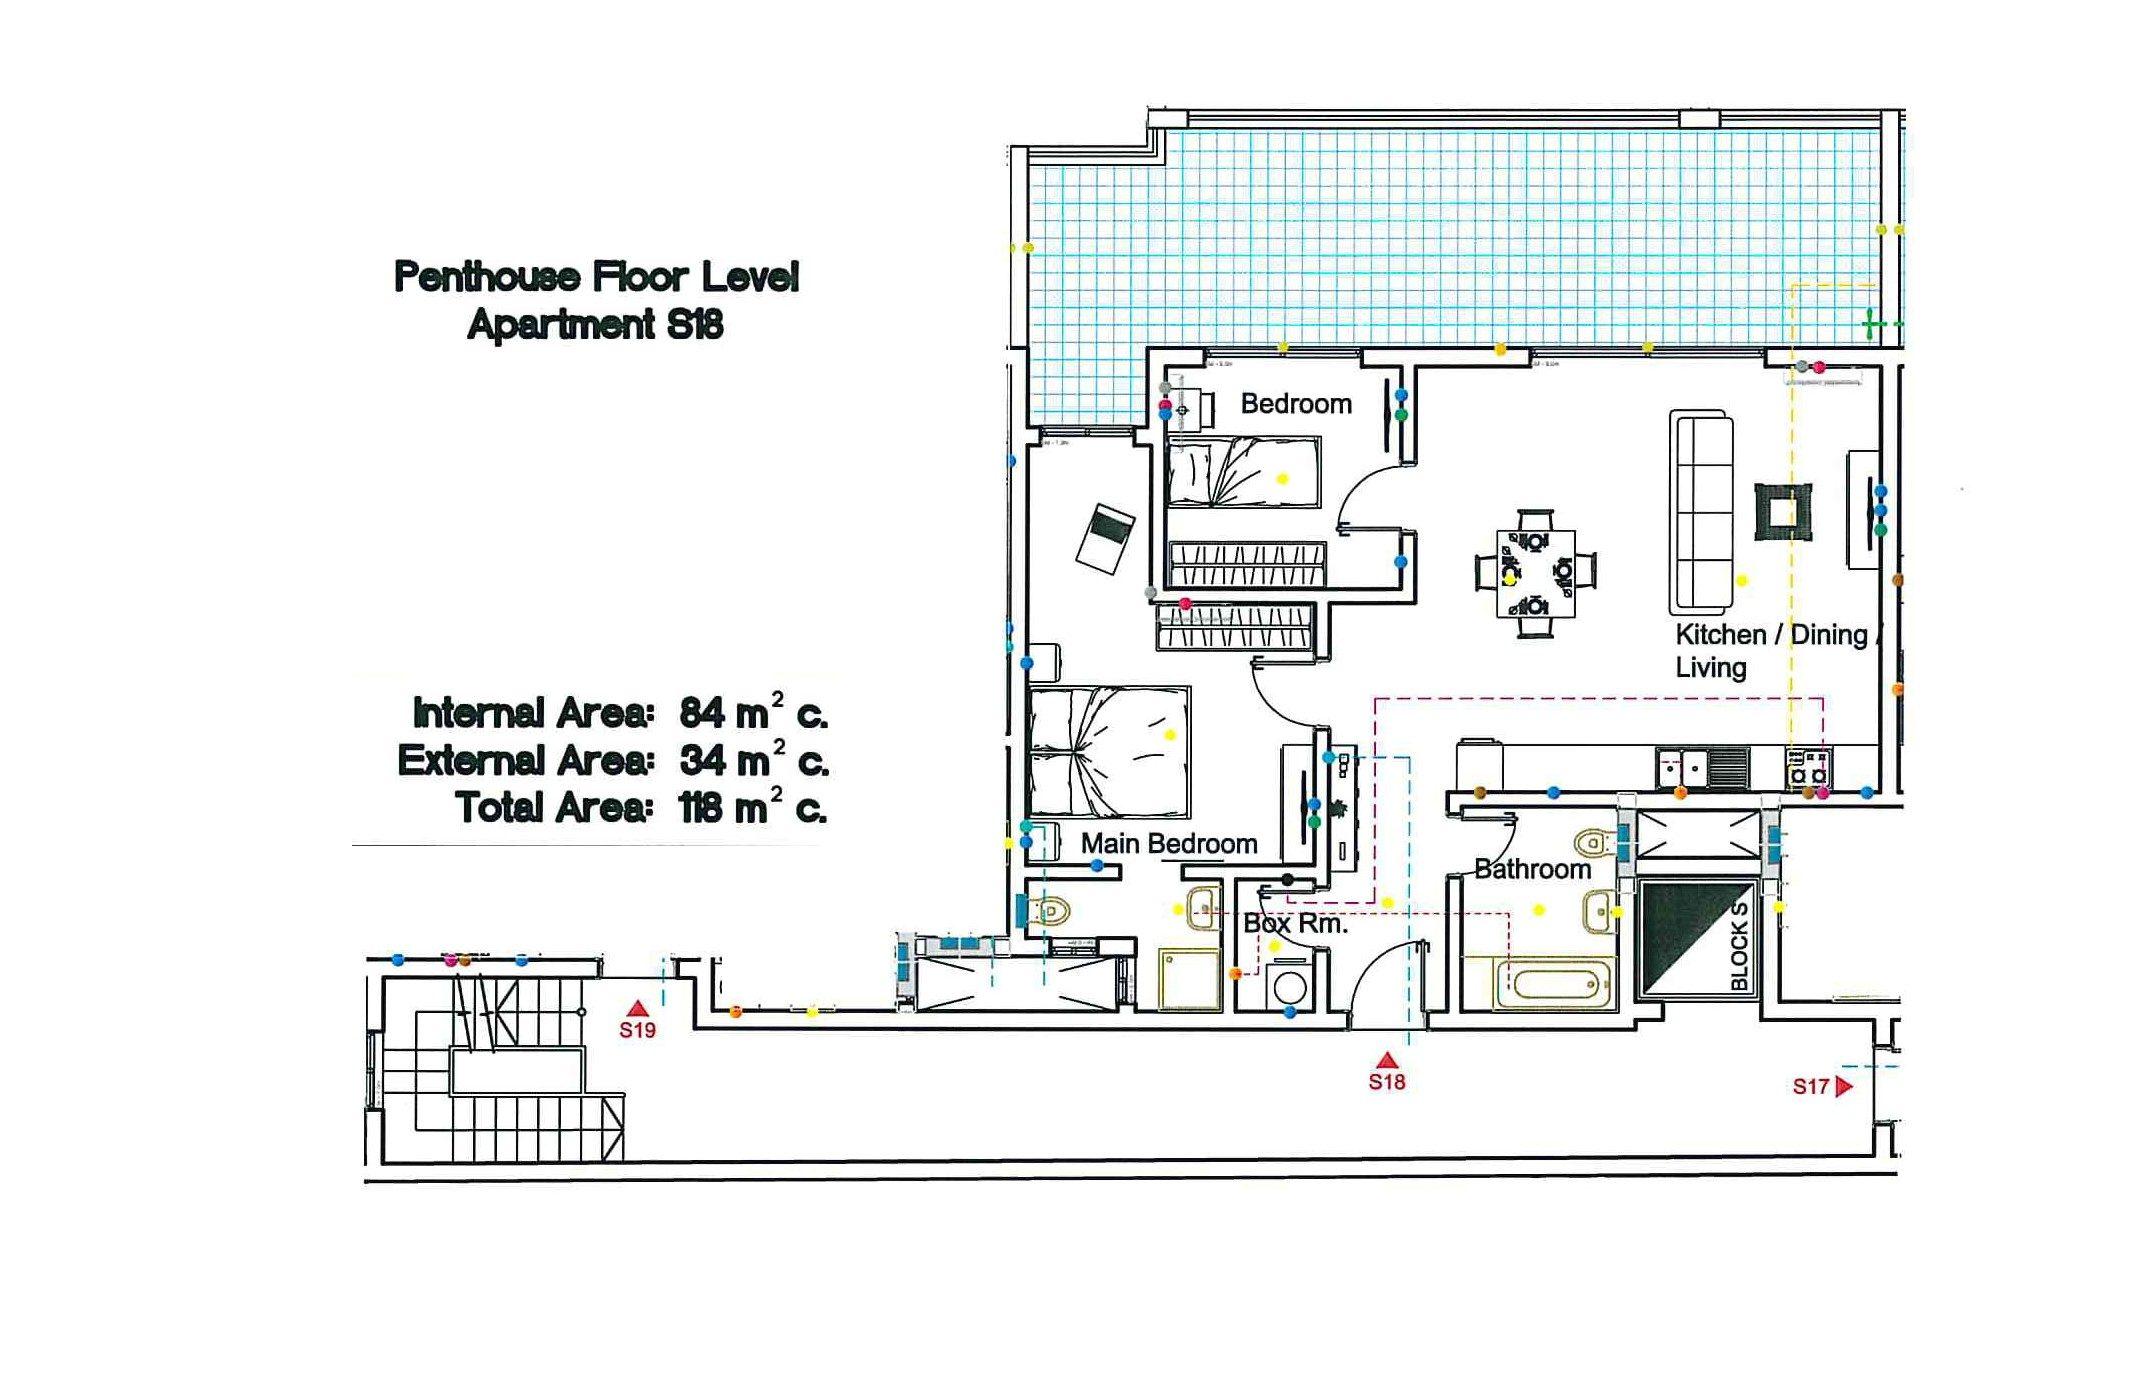 S18 Penthouse